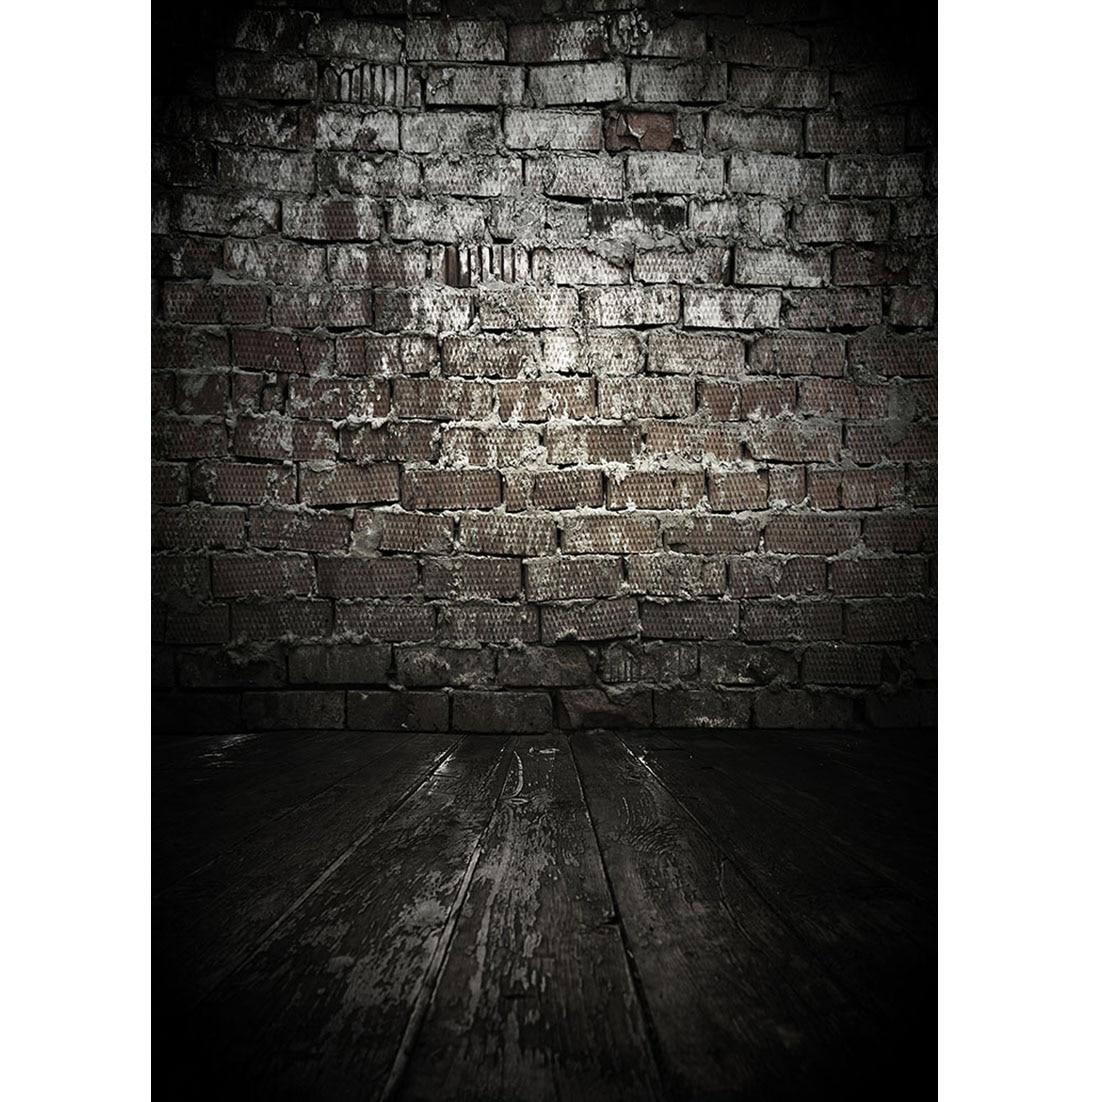 Black Brick Wall Wooden Floor Photography Backdrop Vinyl Backgrounds Photo Studio  for Children Baby Toy Pet Photoshoot Props